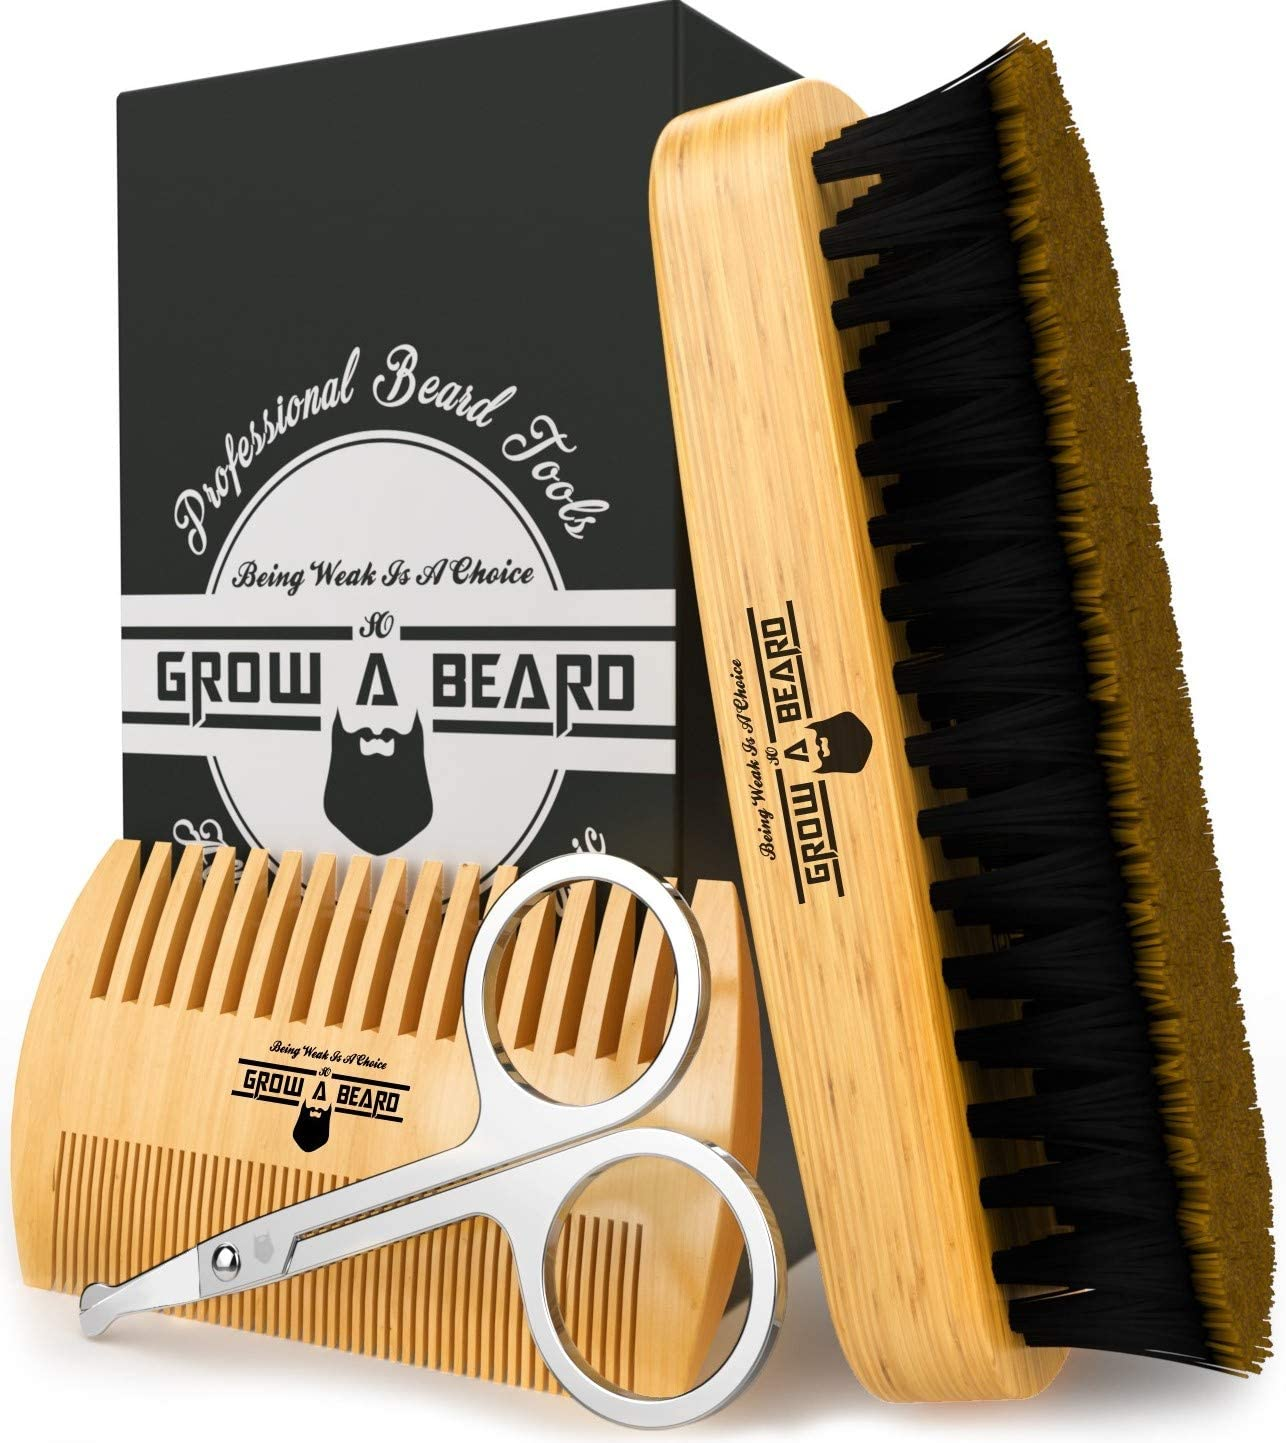 Beard Brush, Comb, & Scissors Grooming Kit